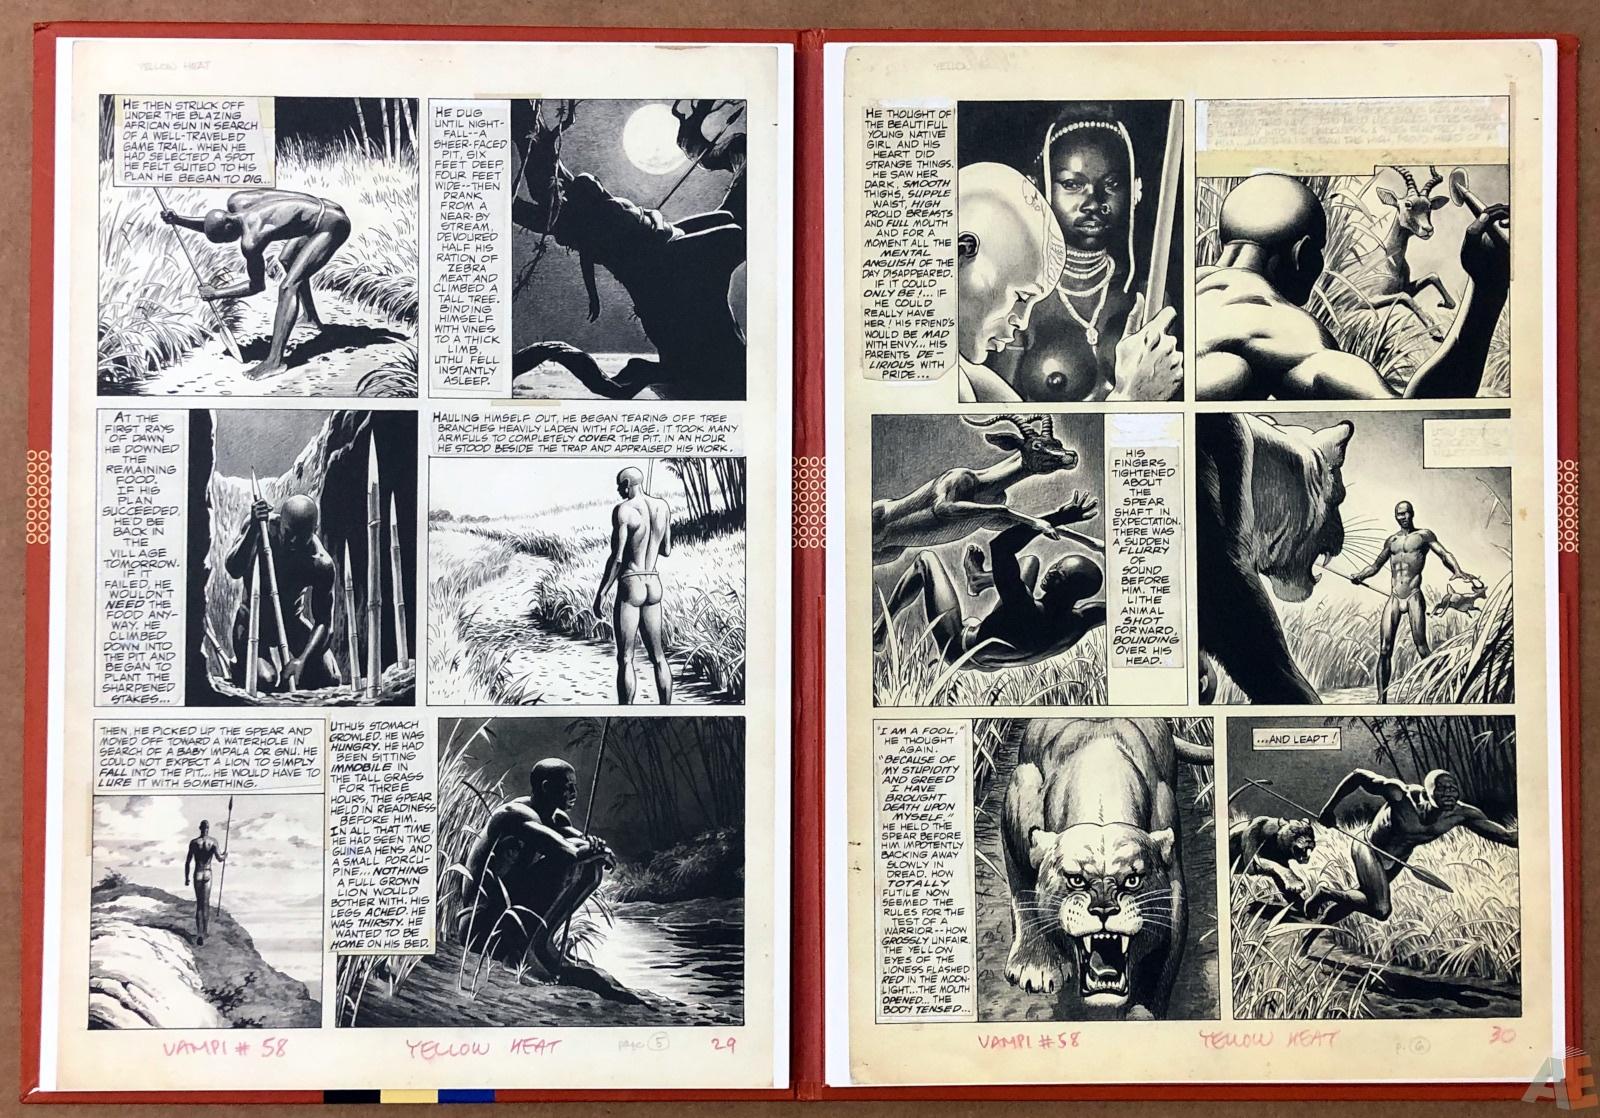 Russ Heath's Yellow Heat Artist's Edition Portfolio 10